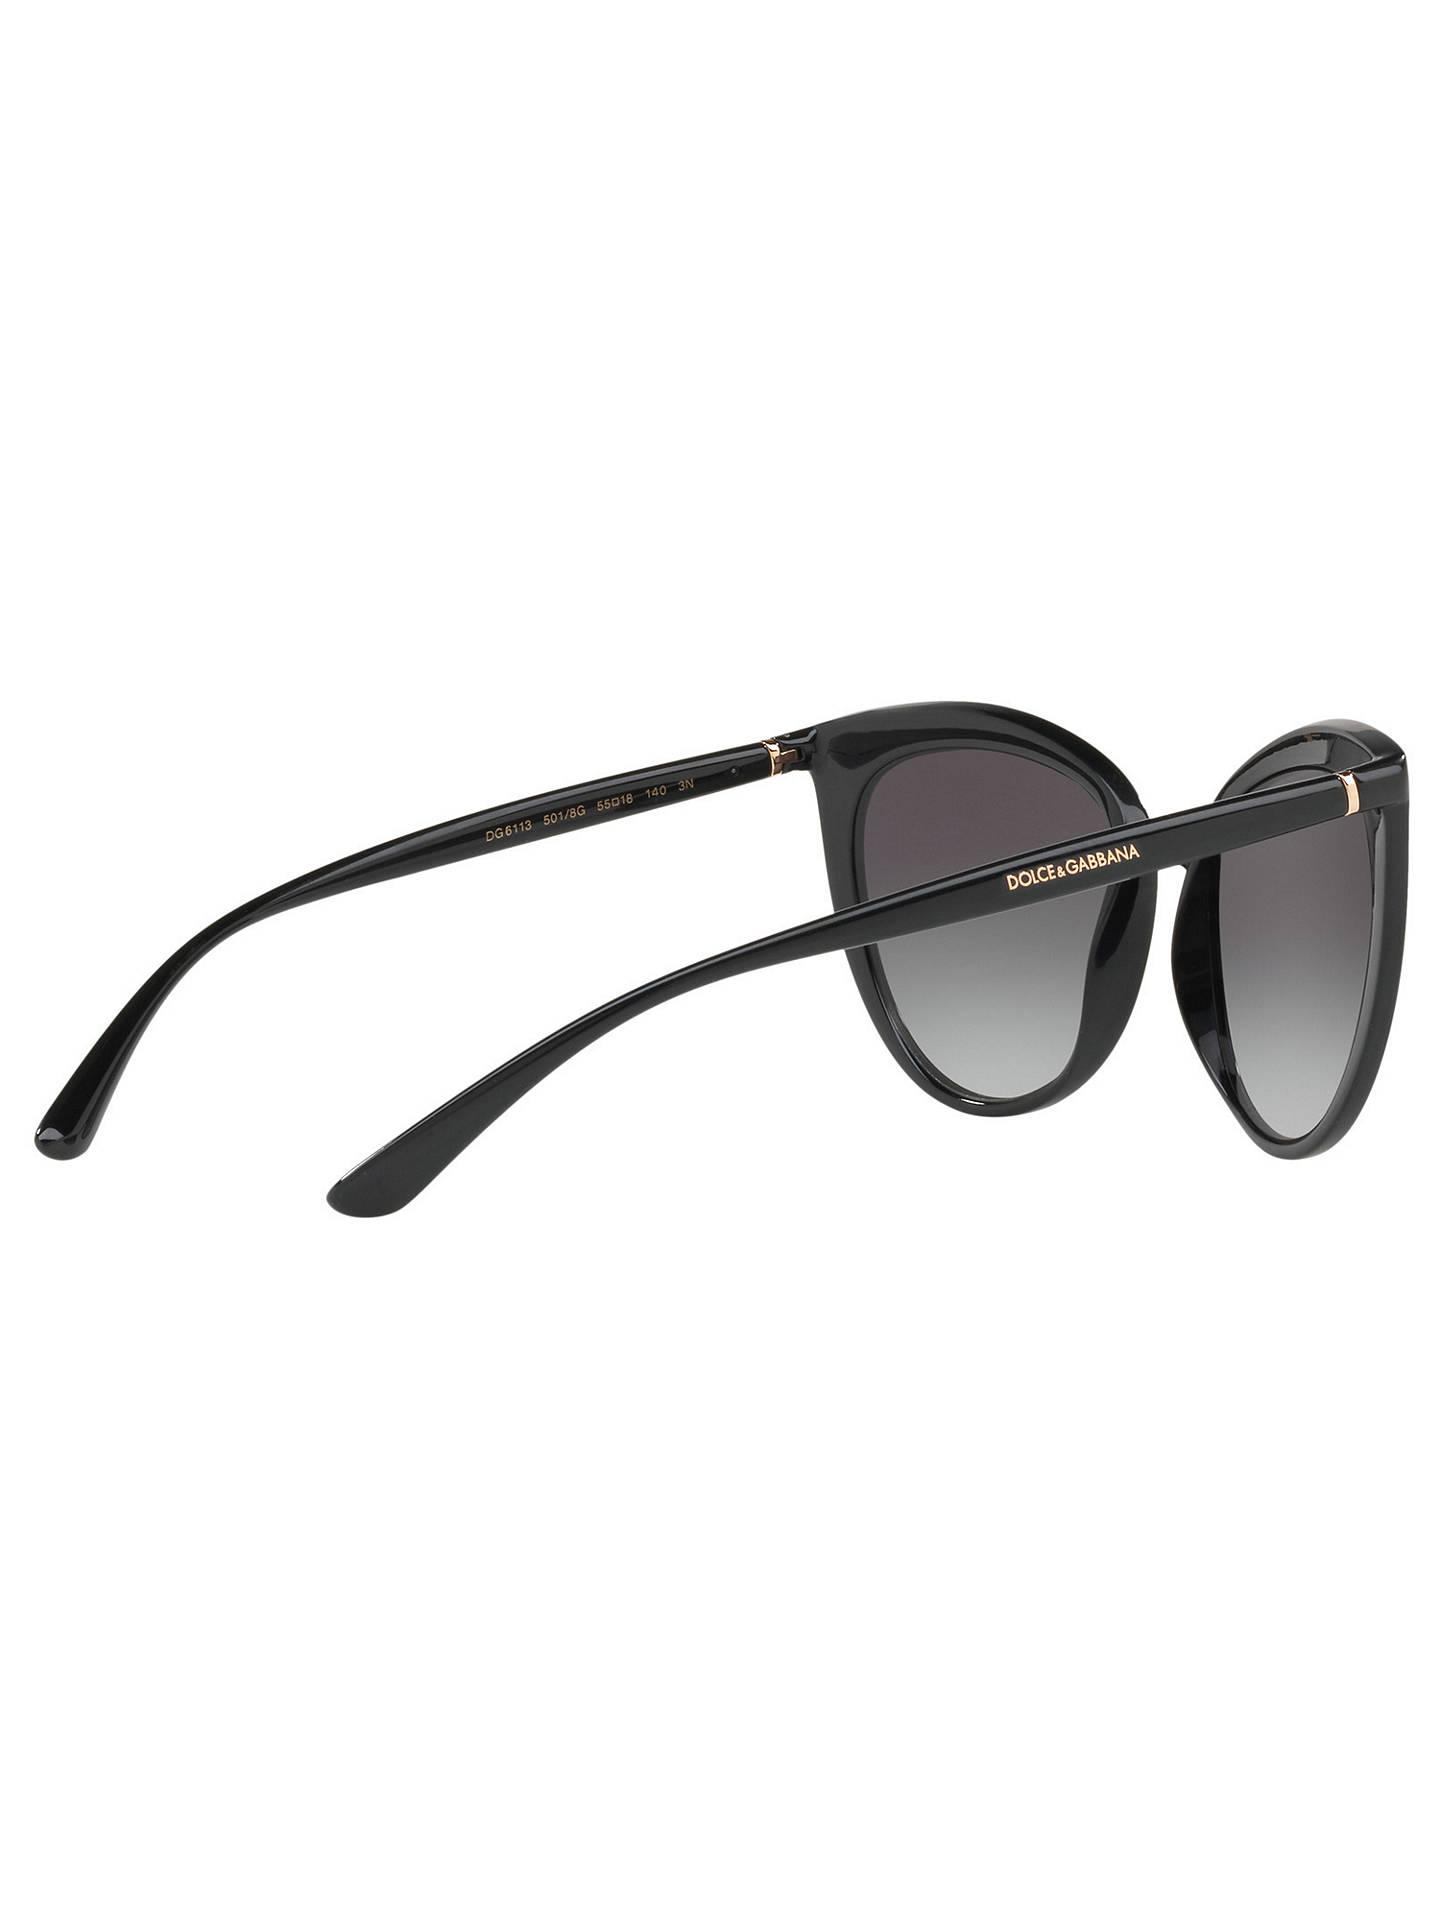 af89c230d134 ... Buy Dolce & Gabbana DG6113 Cat's Eye Sunglasses, Black/Grey Gradient  Online at johnlewis